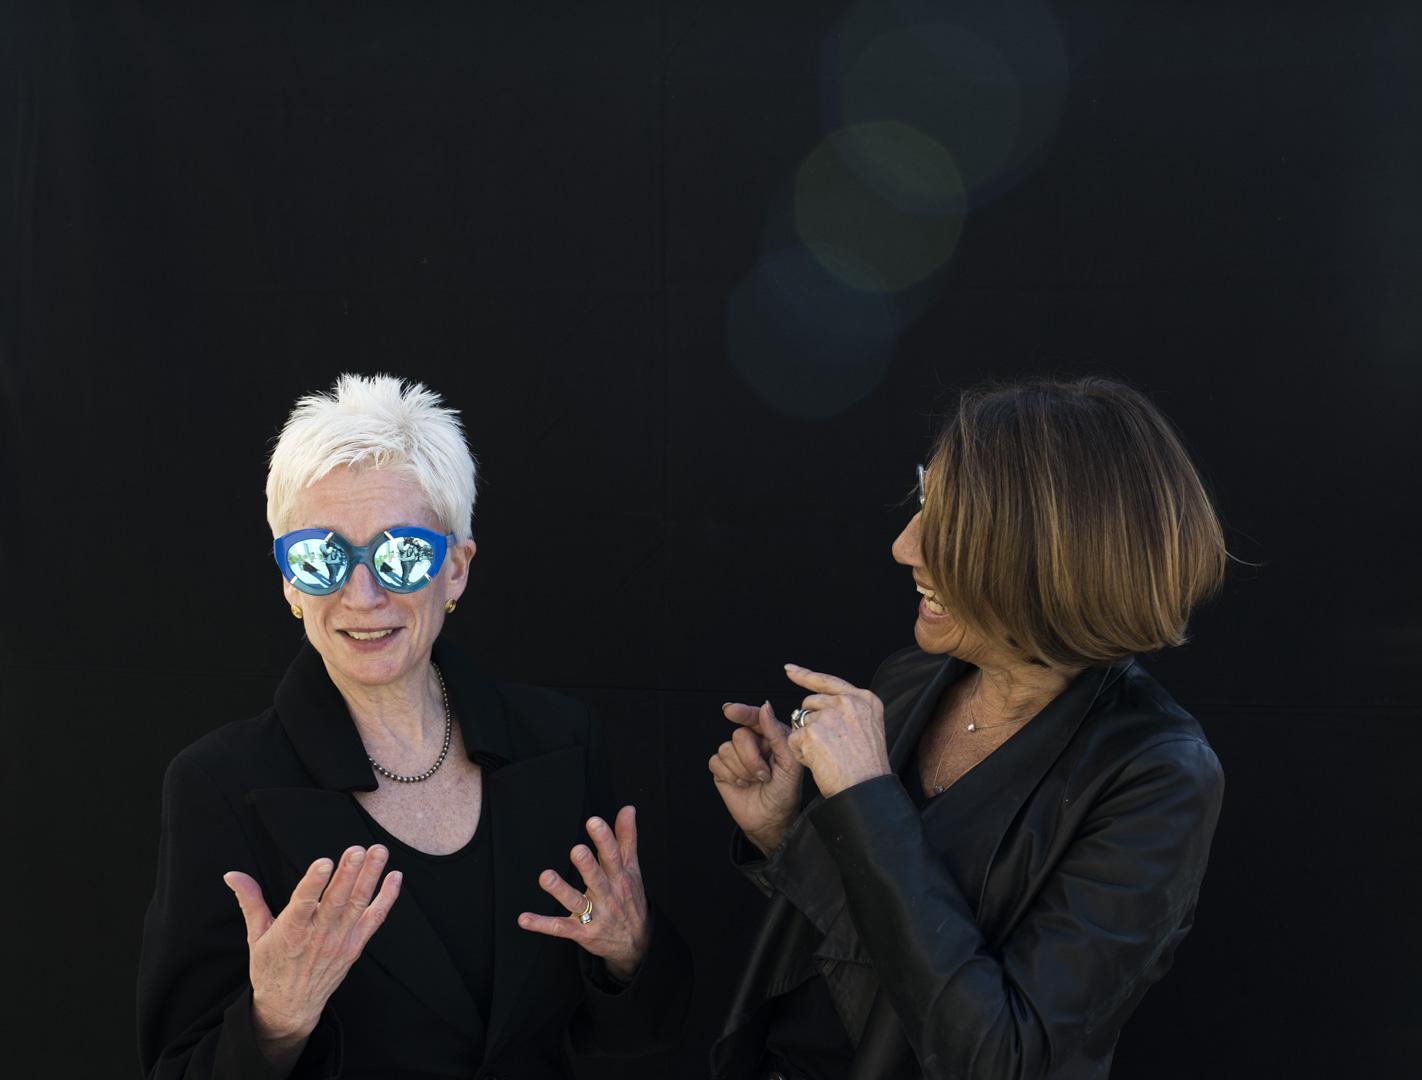 Karen and Erika in conversation